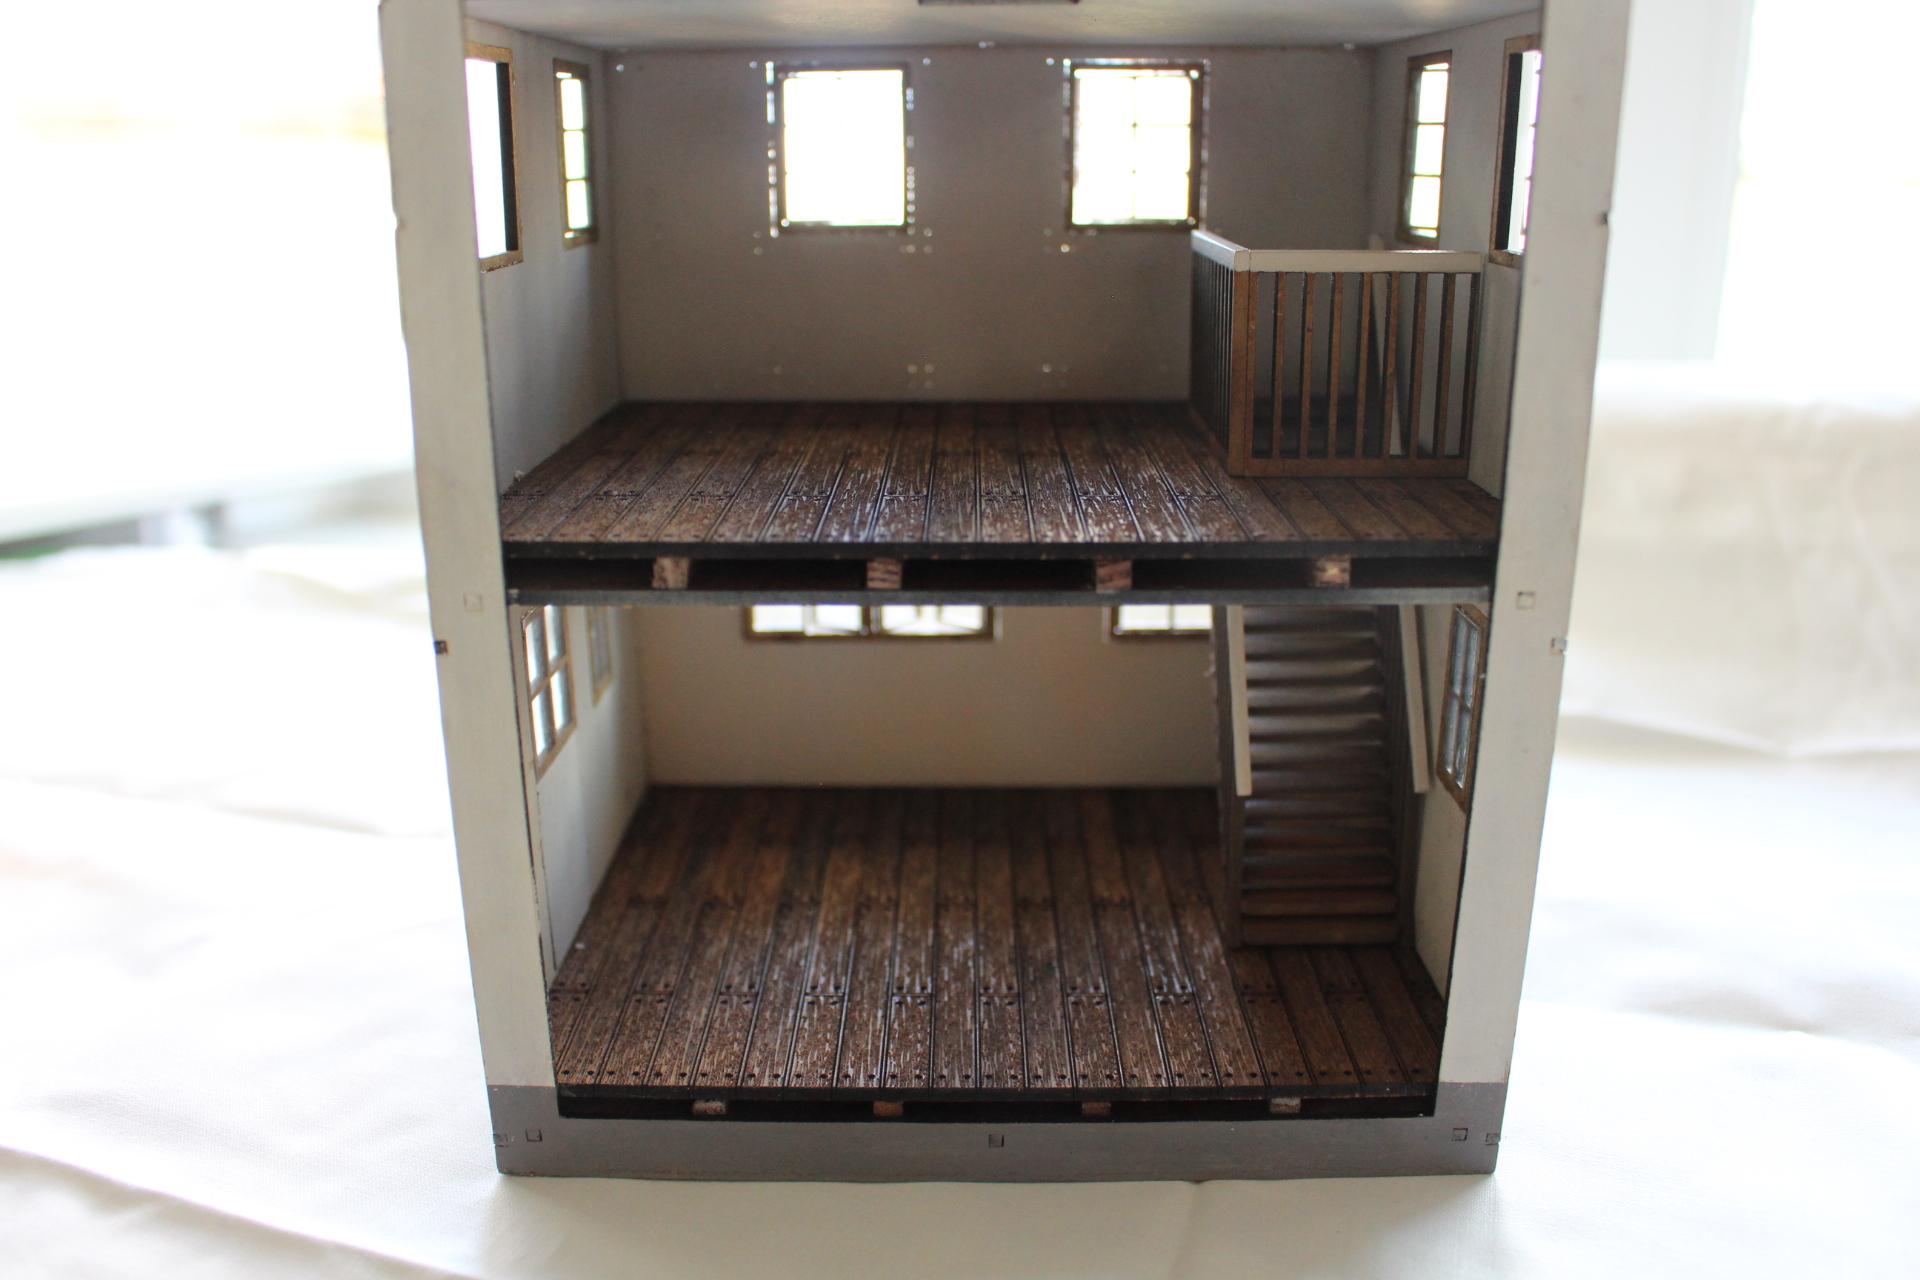 Bild-0 Fachwerkhaus mit Holzschuppen - Lasercut Modellbaushop 1:35